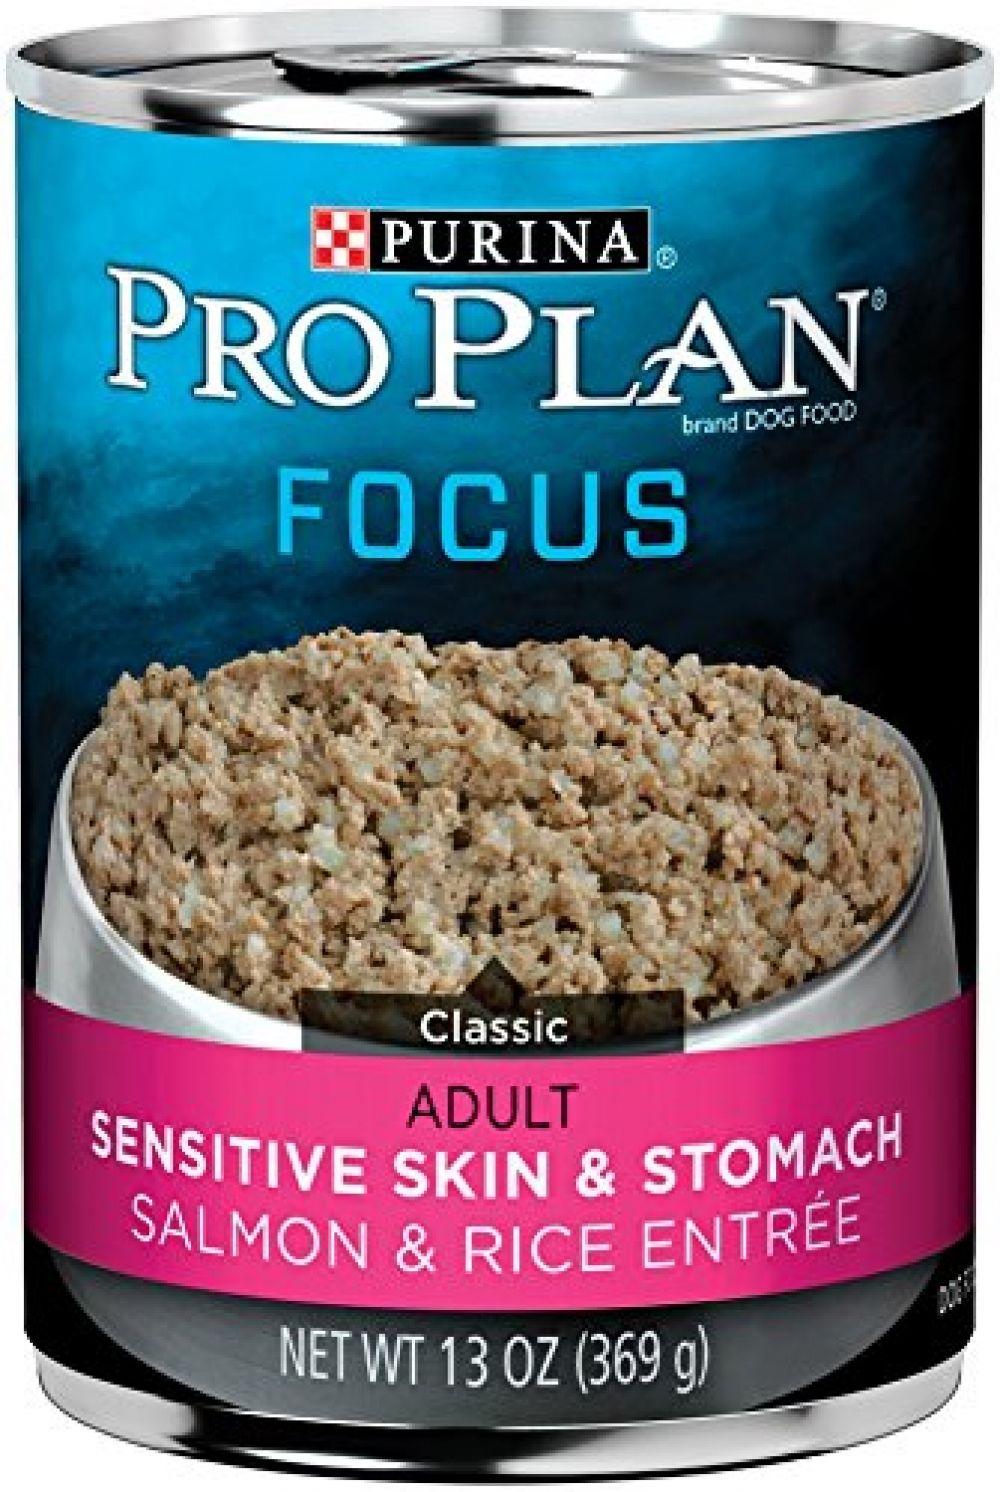 Purina Pro Plan Focus Sensitive Skin Stomach Adult Dry Dog Food